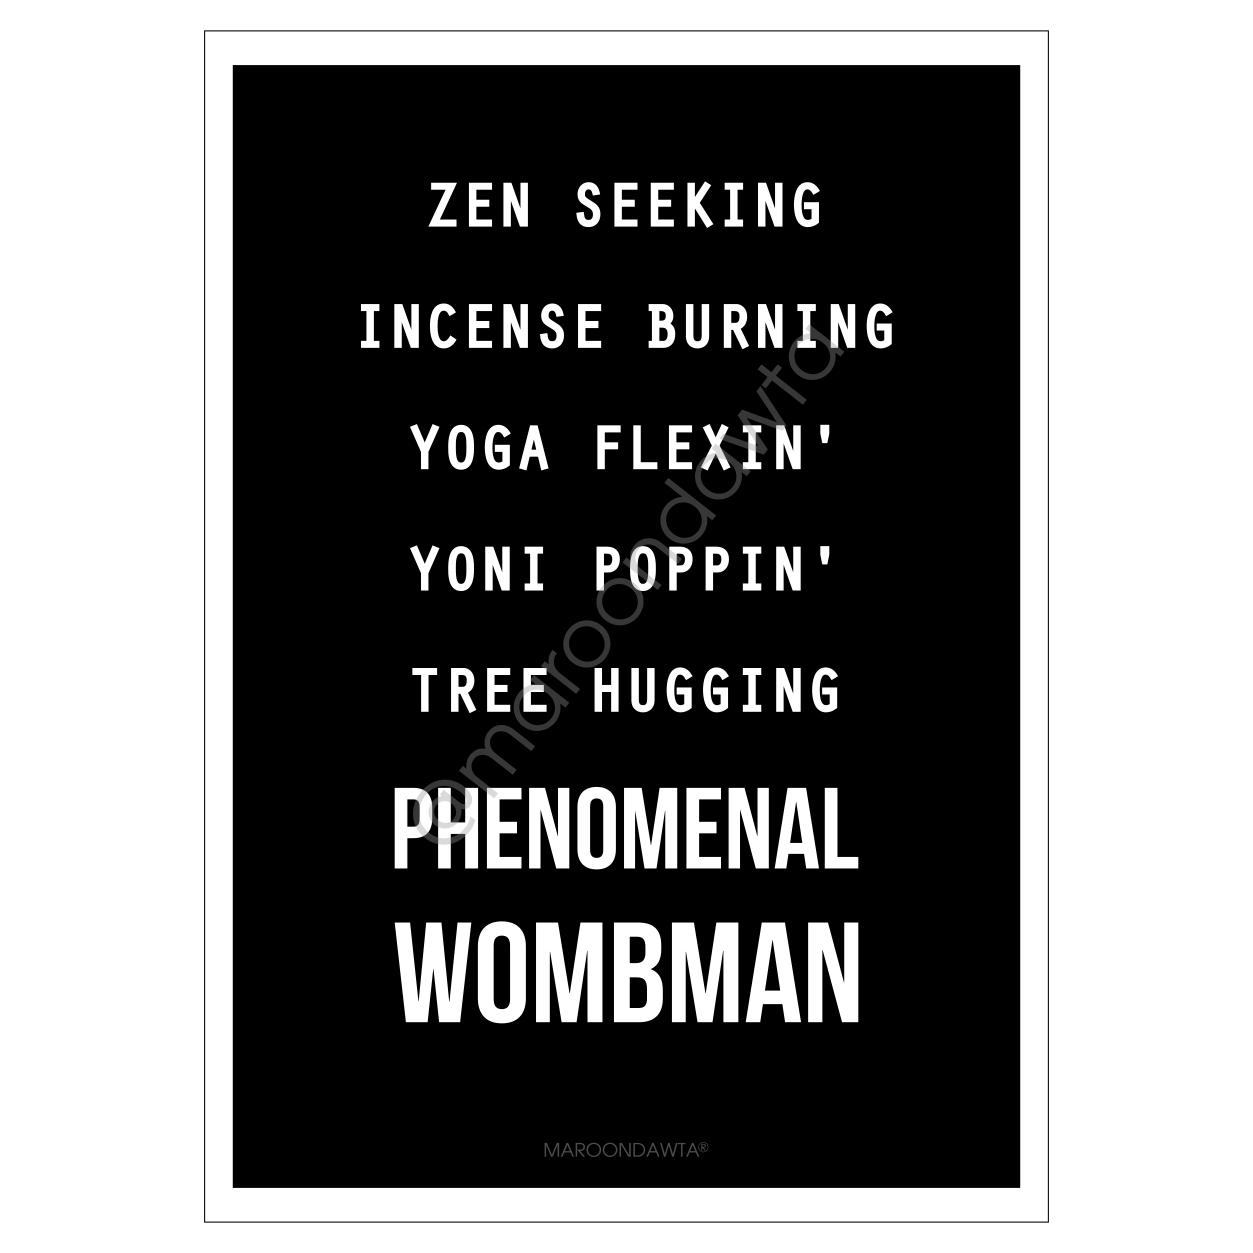 Yoni Poppin' Phenomenal Wombman